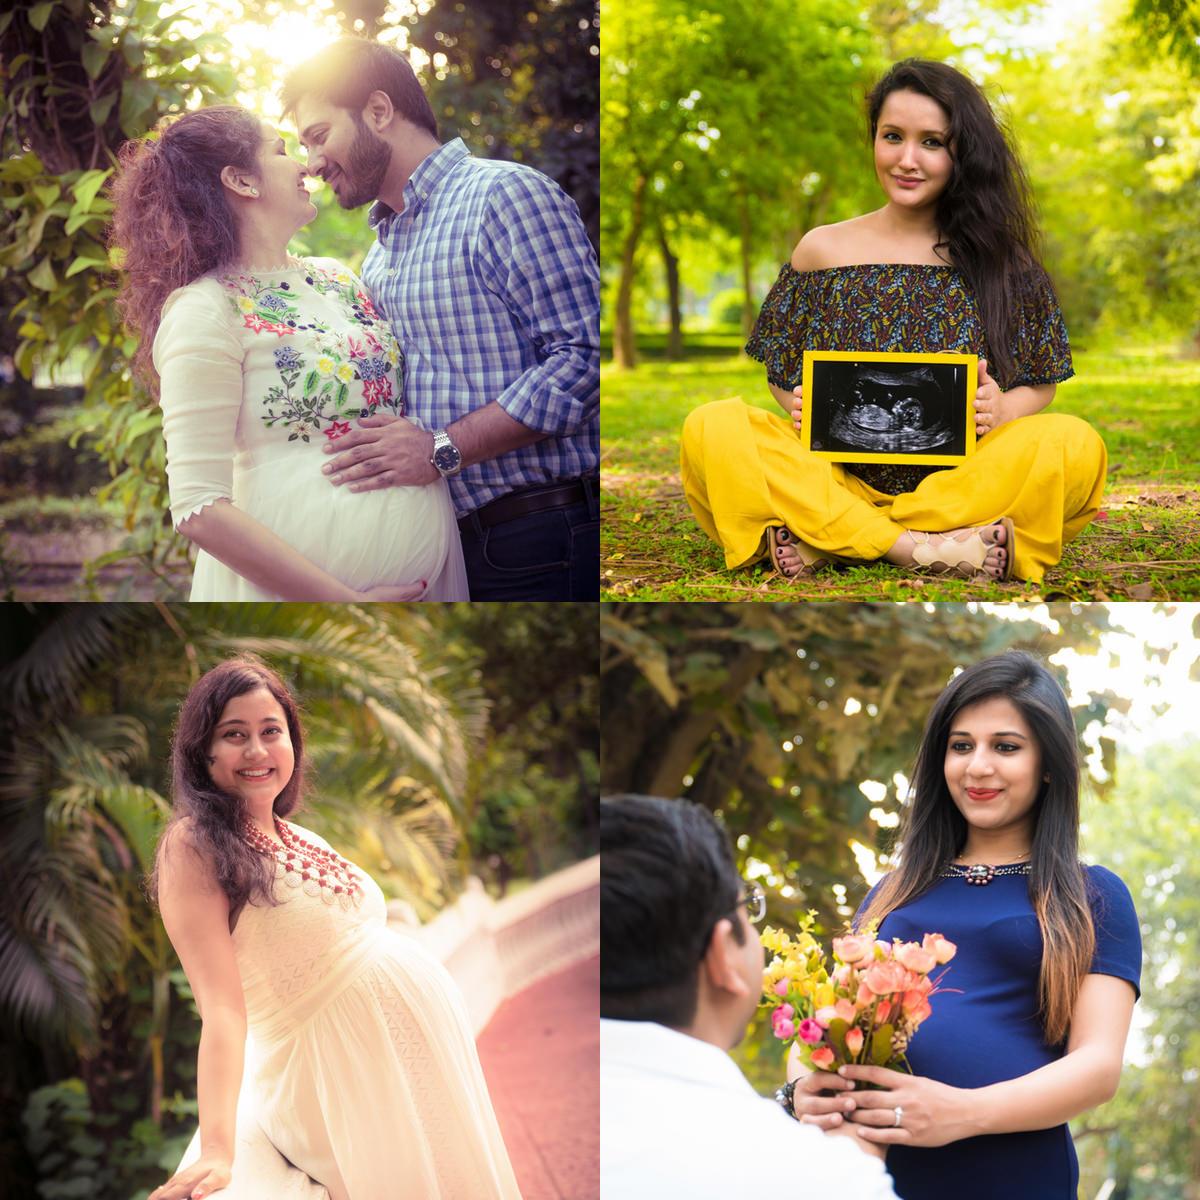 Maternity Photography 1 ❤ NiddledyNoddledy.com ~ Bumps to Babies Photography, Kolkata.jpg